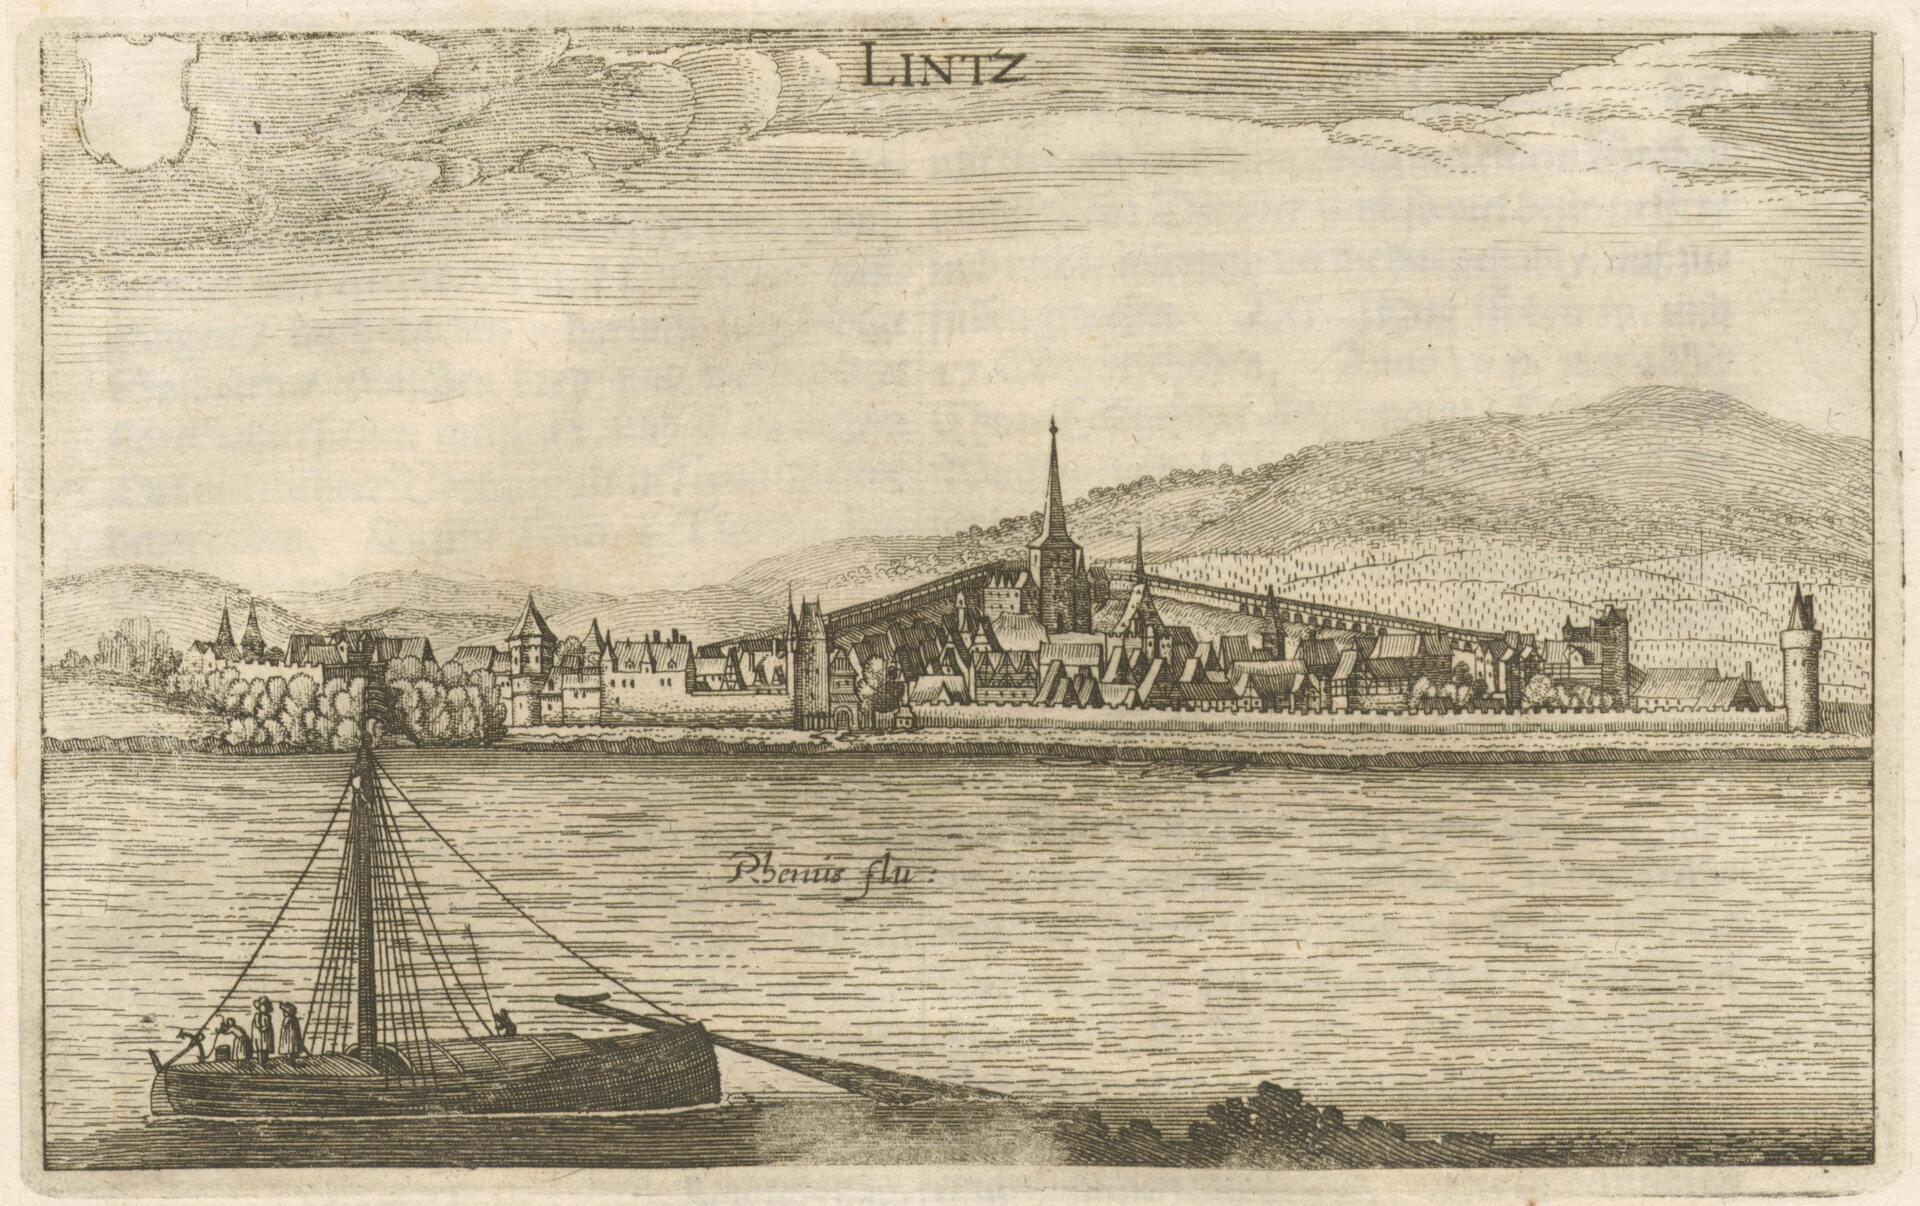 Lintz.jpg